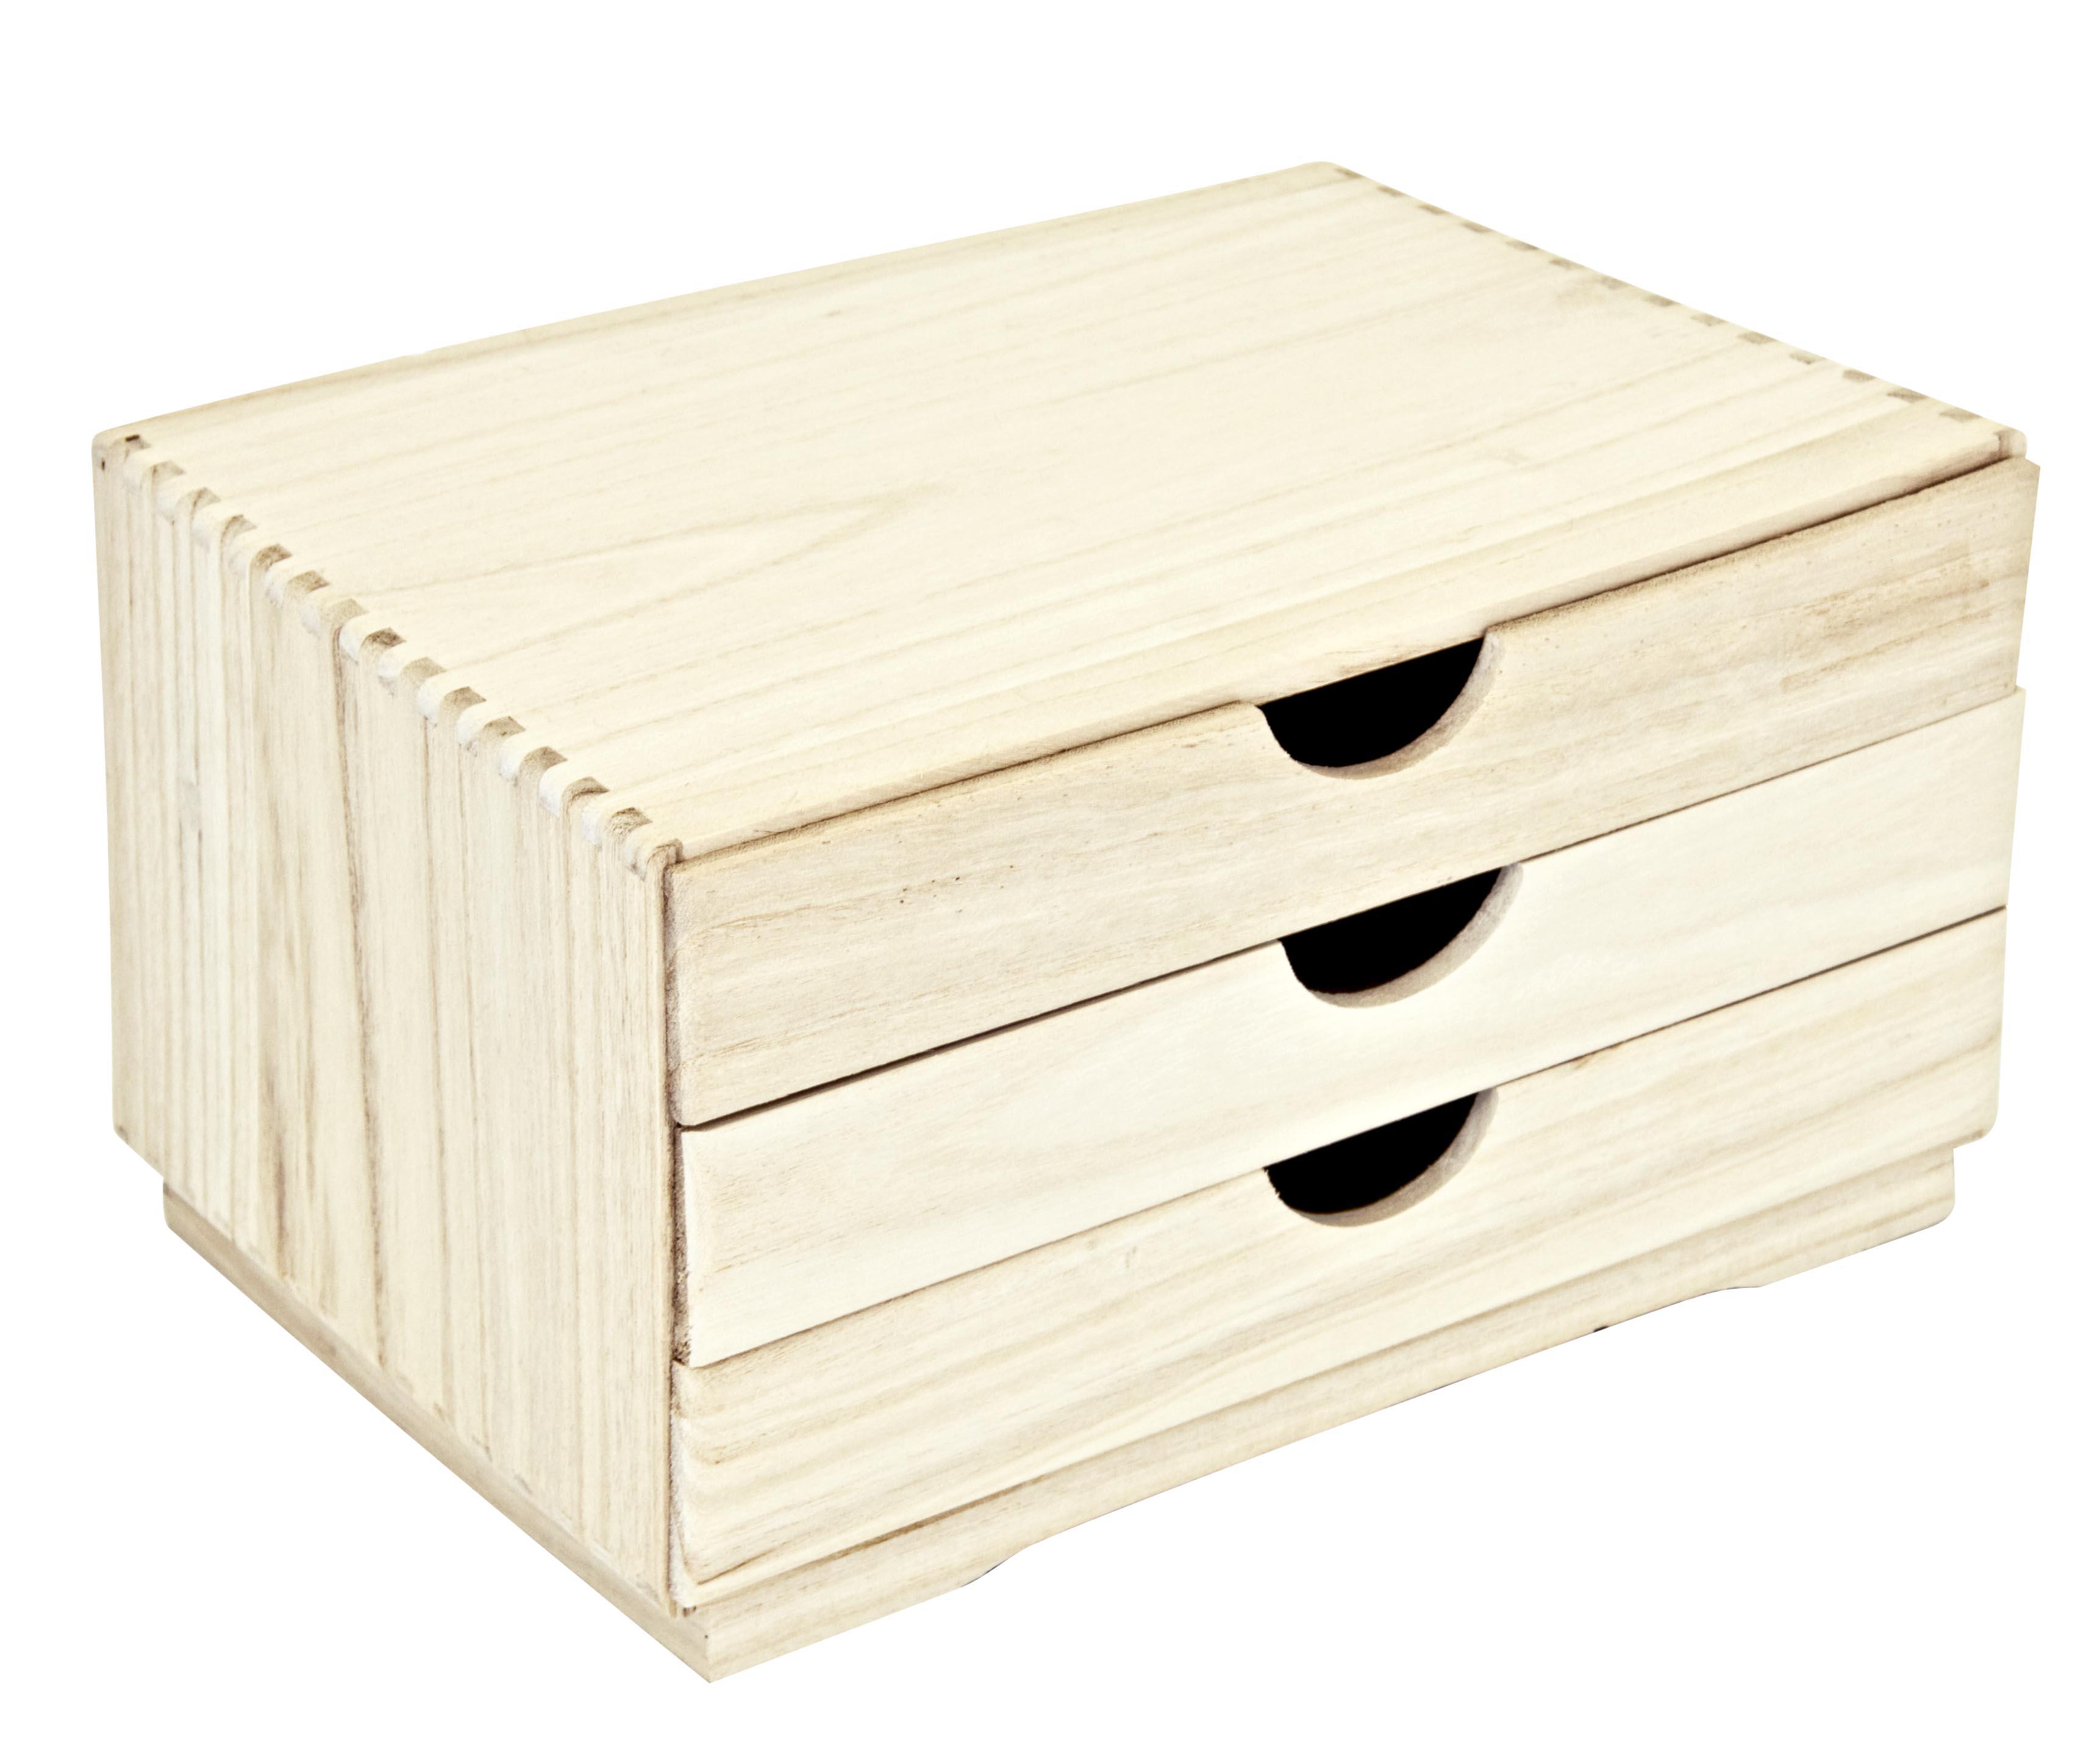 КоробкаКоробки<br>Коробка с 3 ящиками.&amp;amp;nbsp;<br><br>Material: Дерево<br>Length см: None<br>Width см: 34<br>Depth см: 25<br>Height см: 19.5